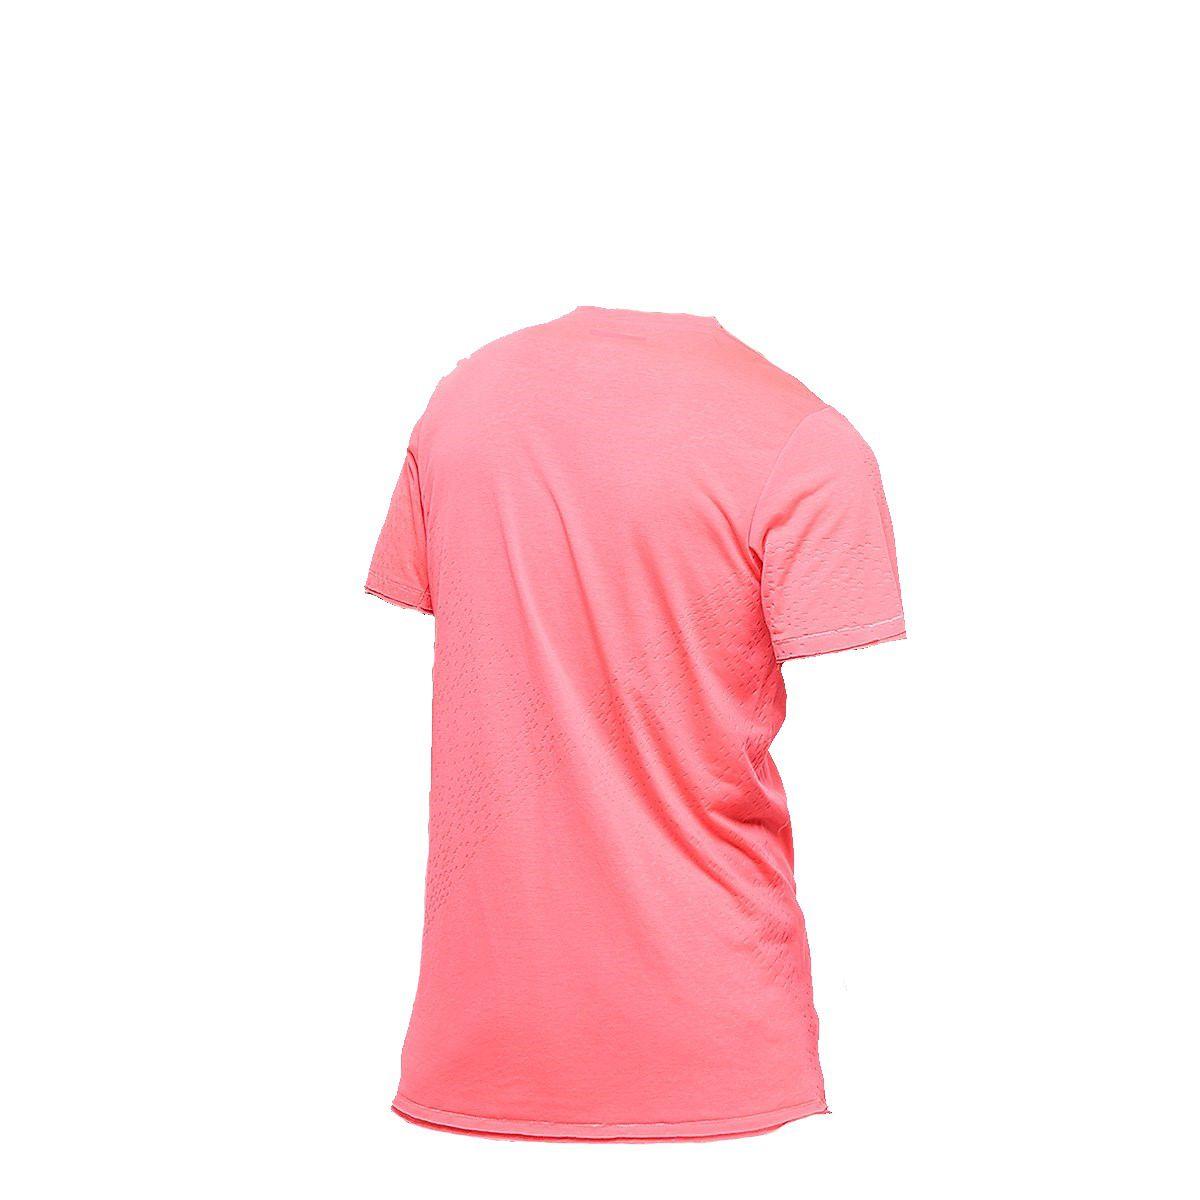 Camiseta Adidas Supernova Alive Coral